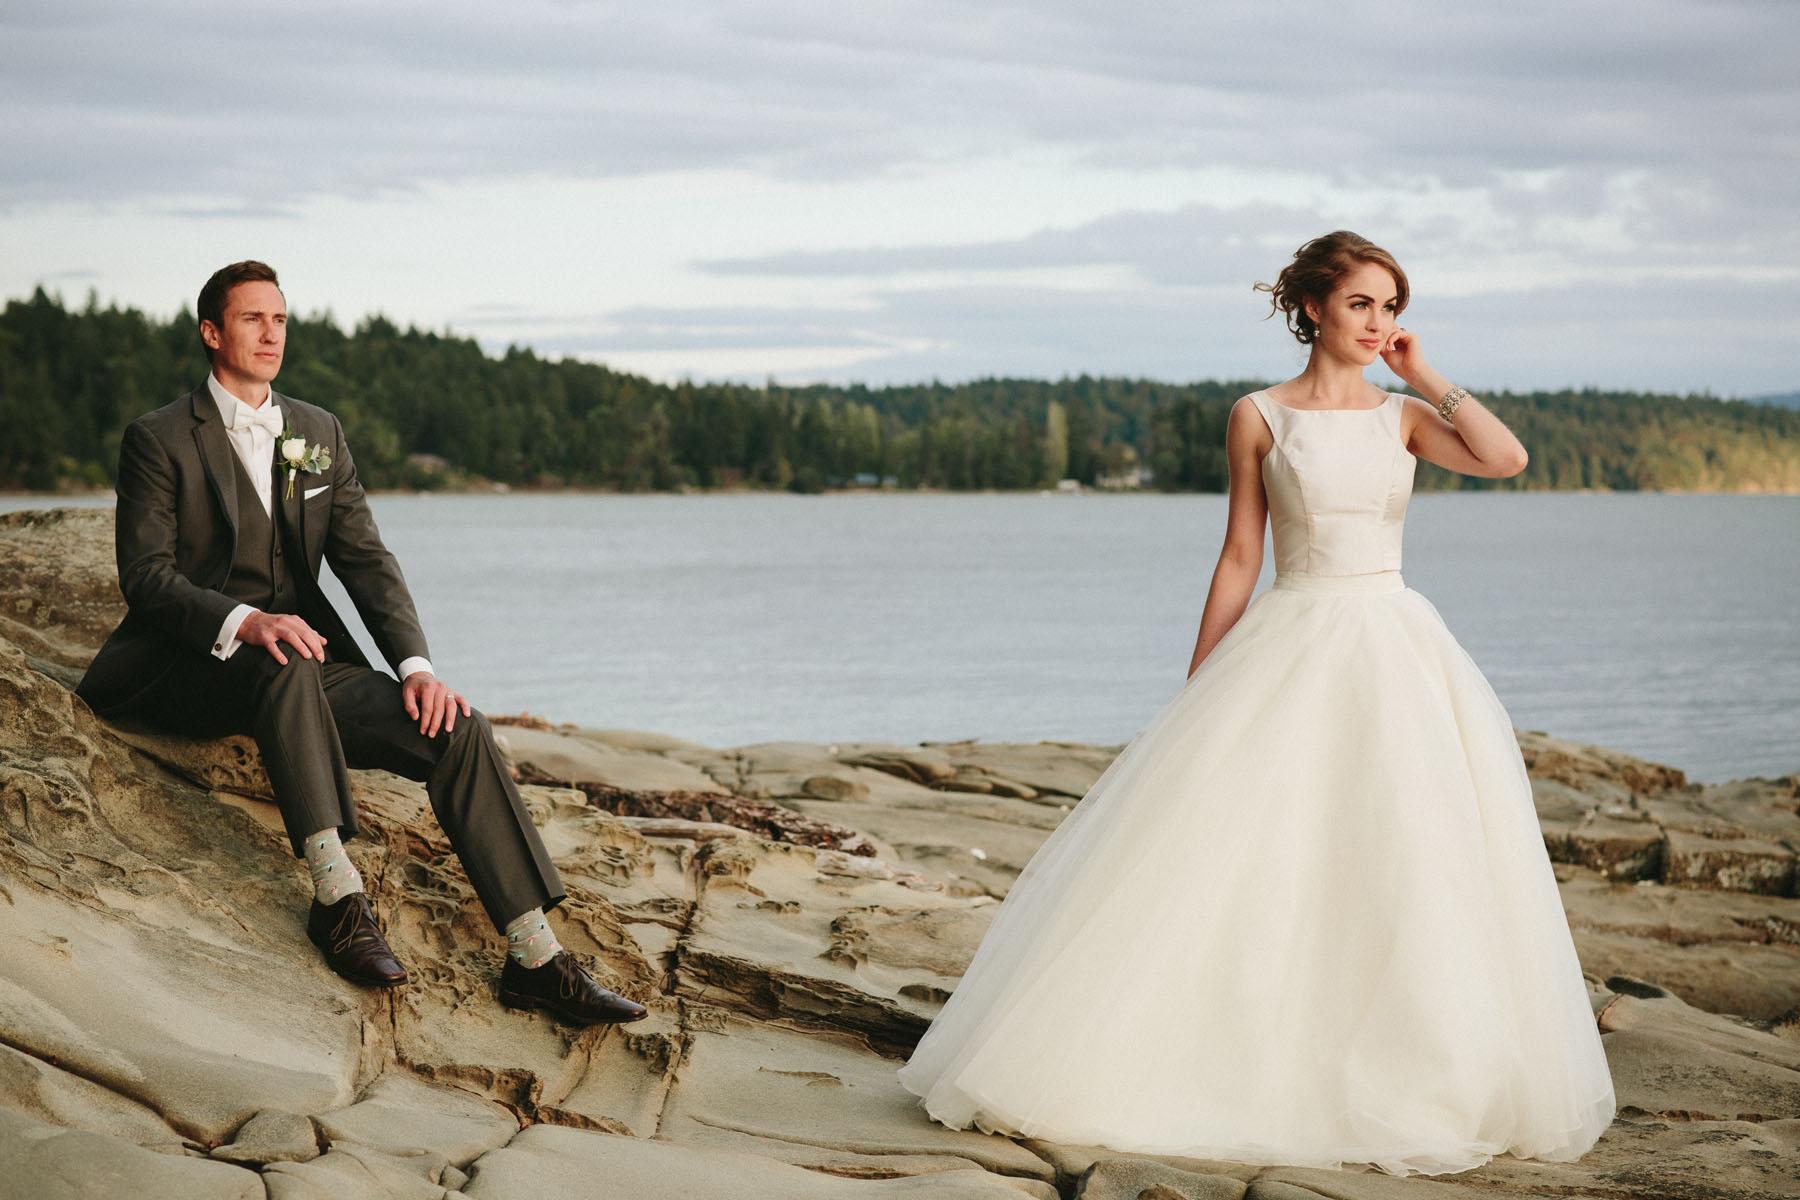 thetis-island-wedding-photographer-rp-rn-146.jpg